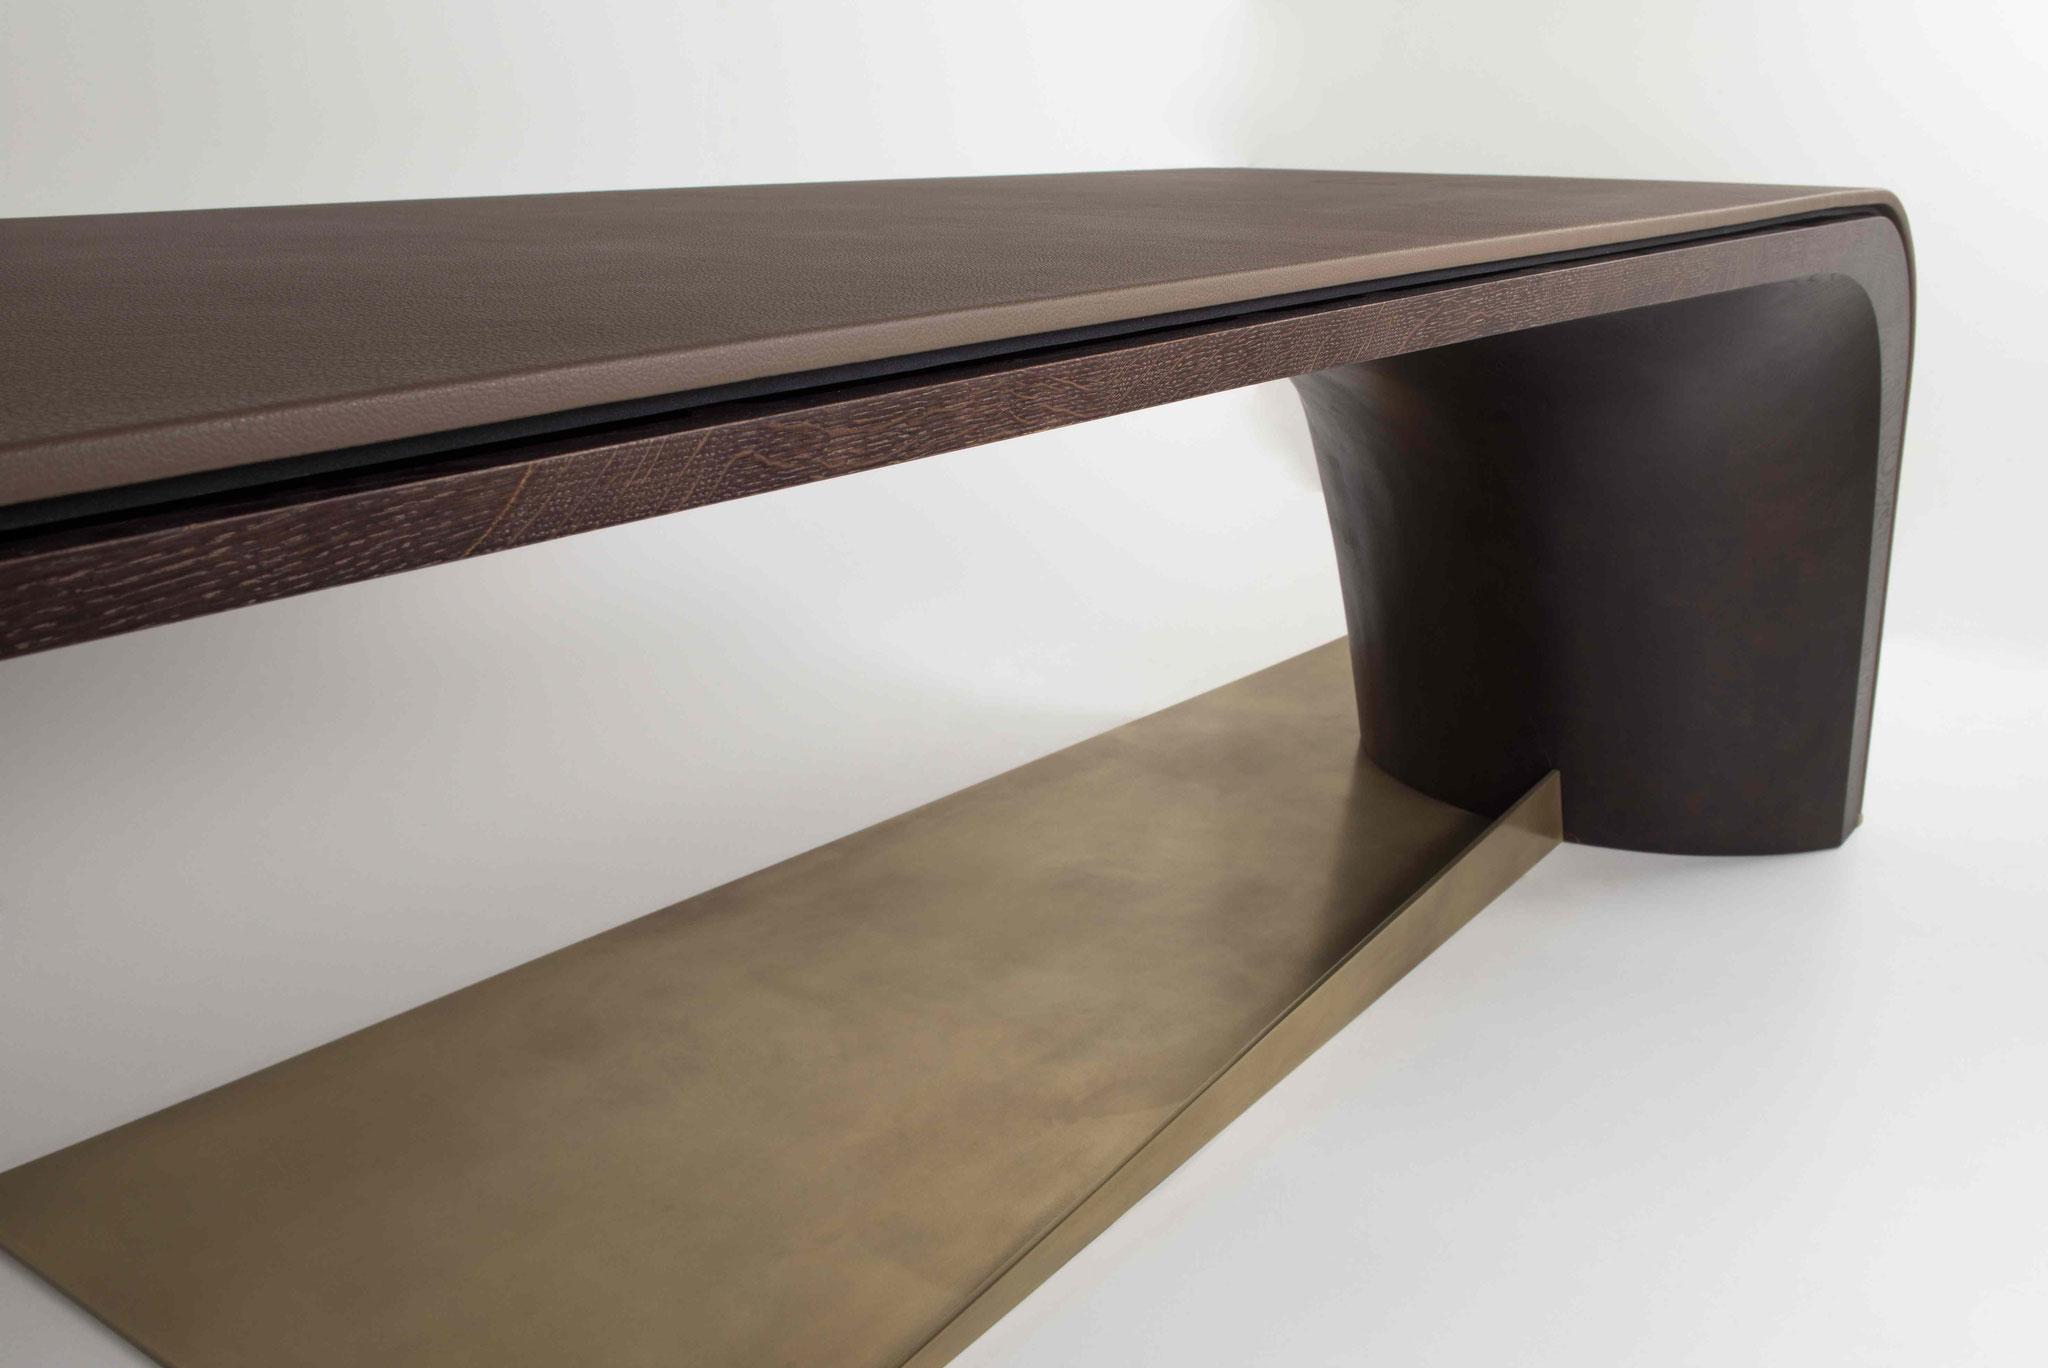 Sliding desk dark temtation, Grundkörper Eiche massiv dunkel gebeizt, Tischplatte Leder